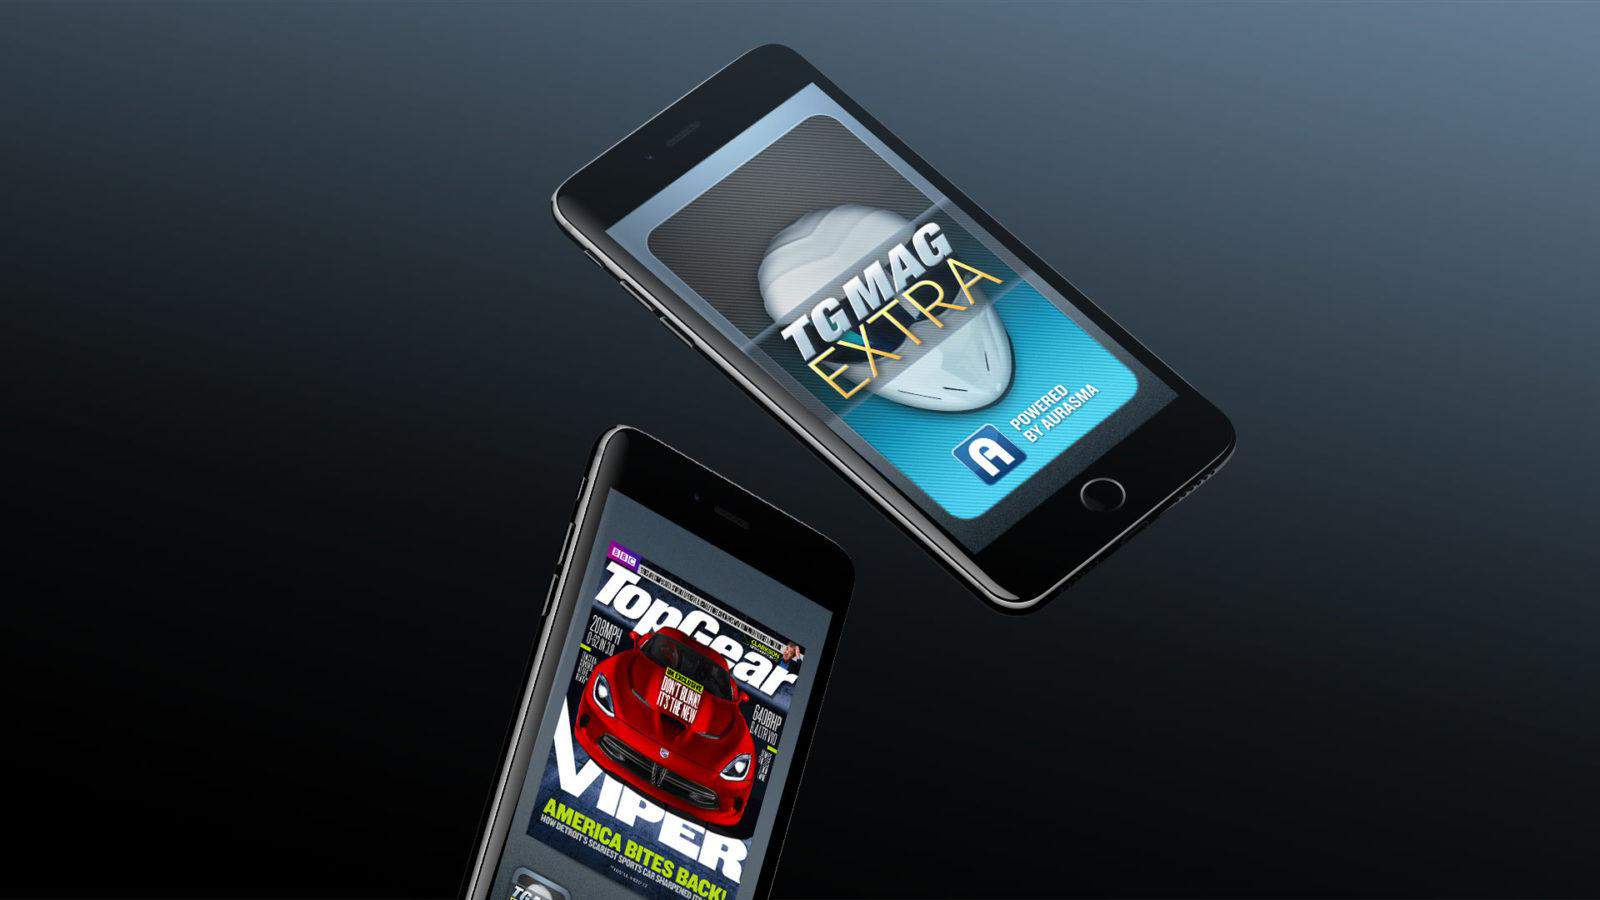 Top Gear extra app